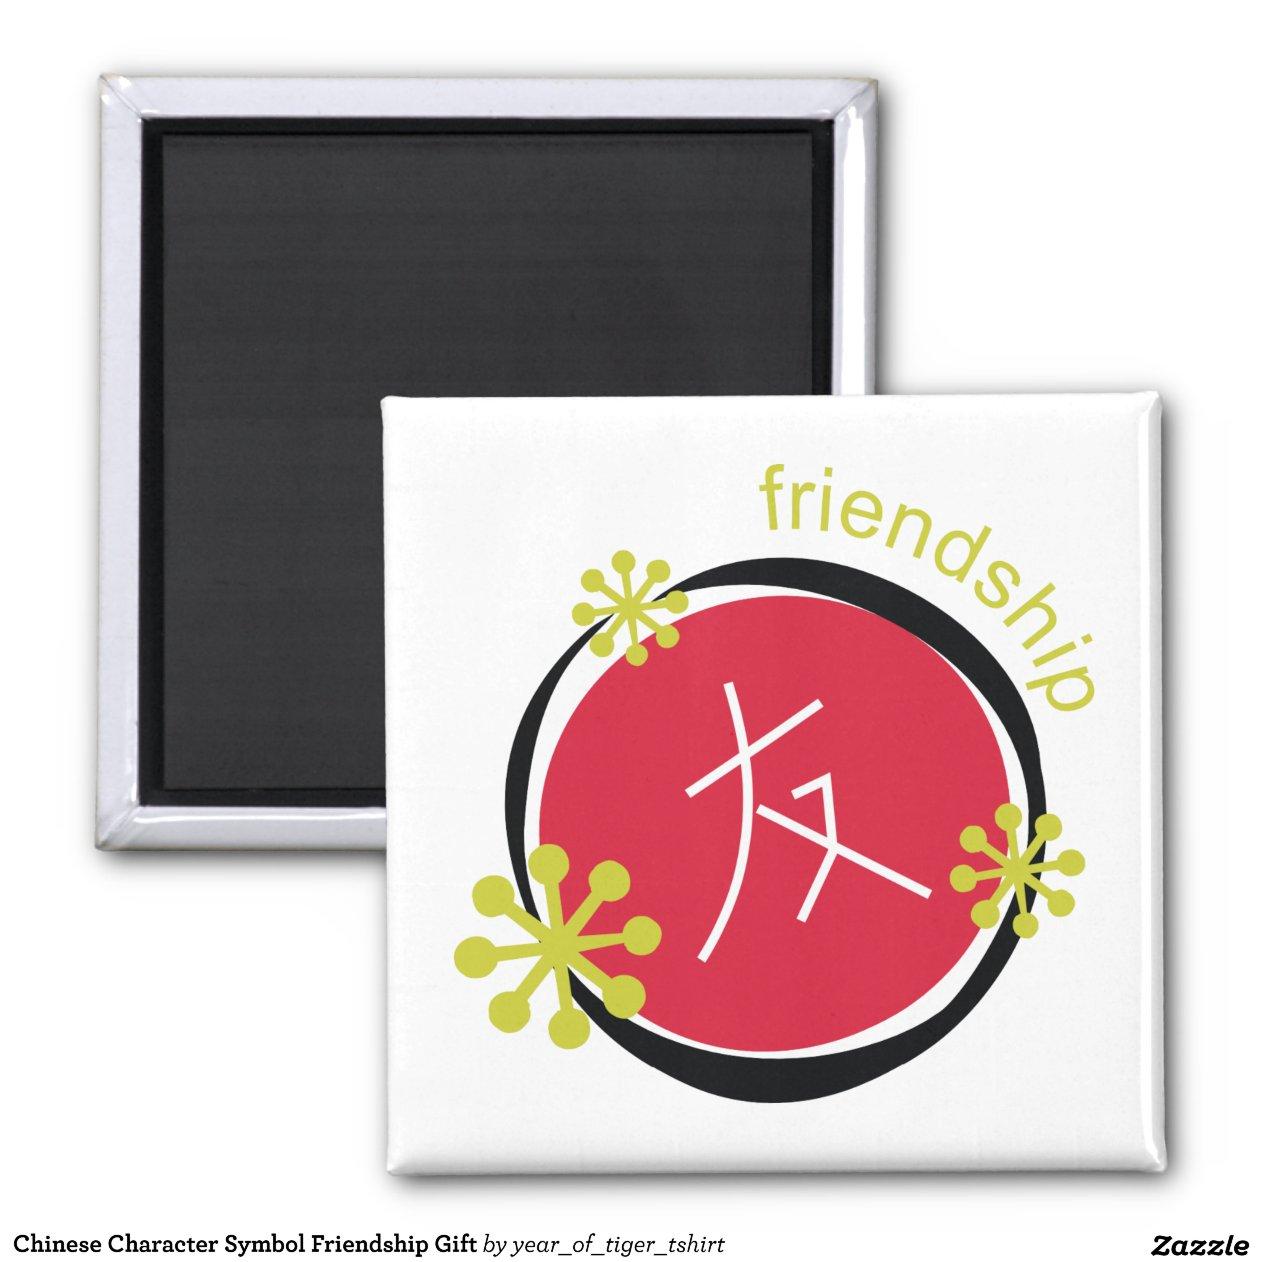 cadeau d 39 amiti de symbole de caract re chinois magnet carr zazzle. Black Bedroom Furniture Sets. Home Design Ideas